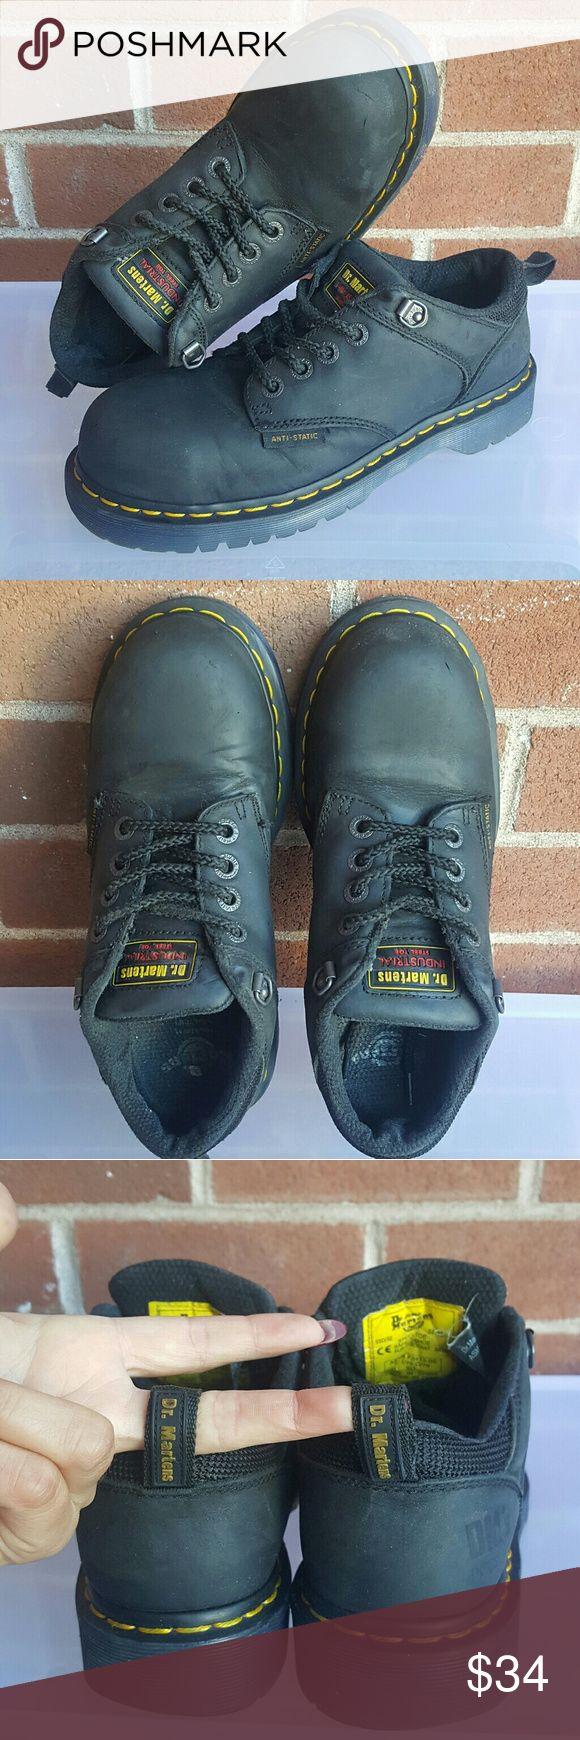 Doc Dr Martens Industrial Steel Toe Shoes Dr Martens Size 7M Ashridge Industrial Work Steel Toe Safety Slip Resistant Shoes Dr. Martens Shoes